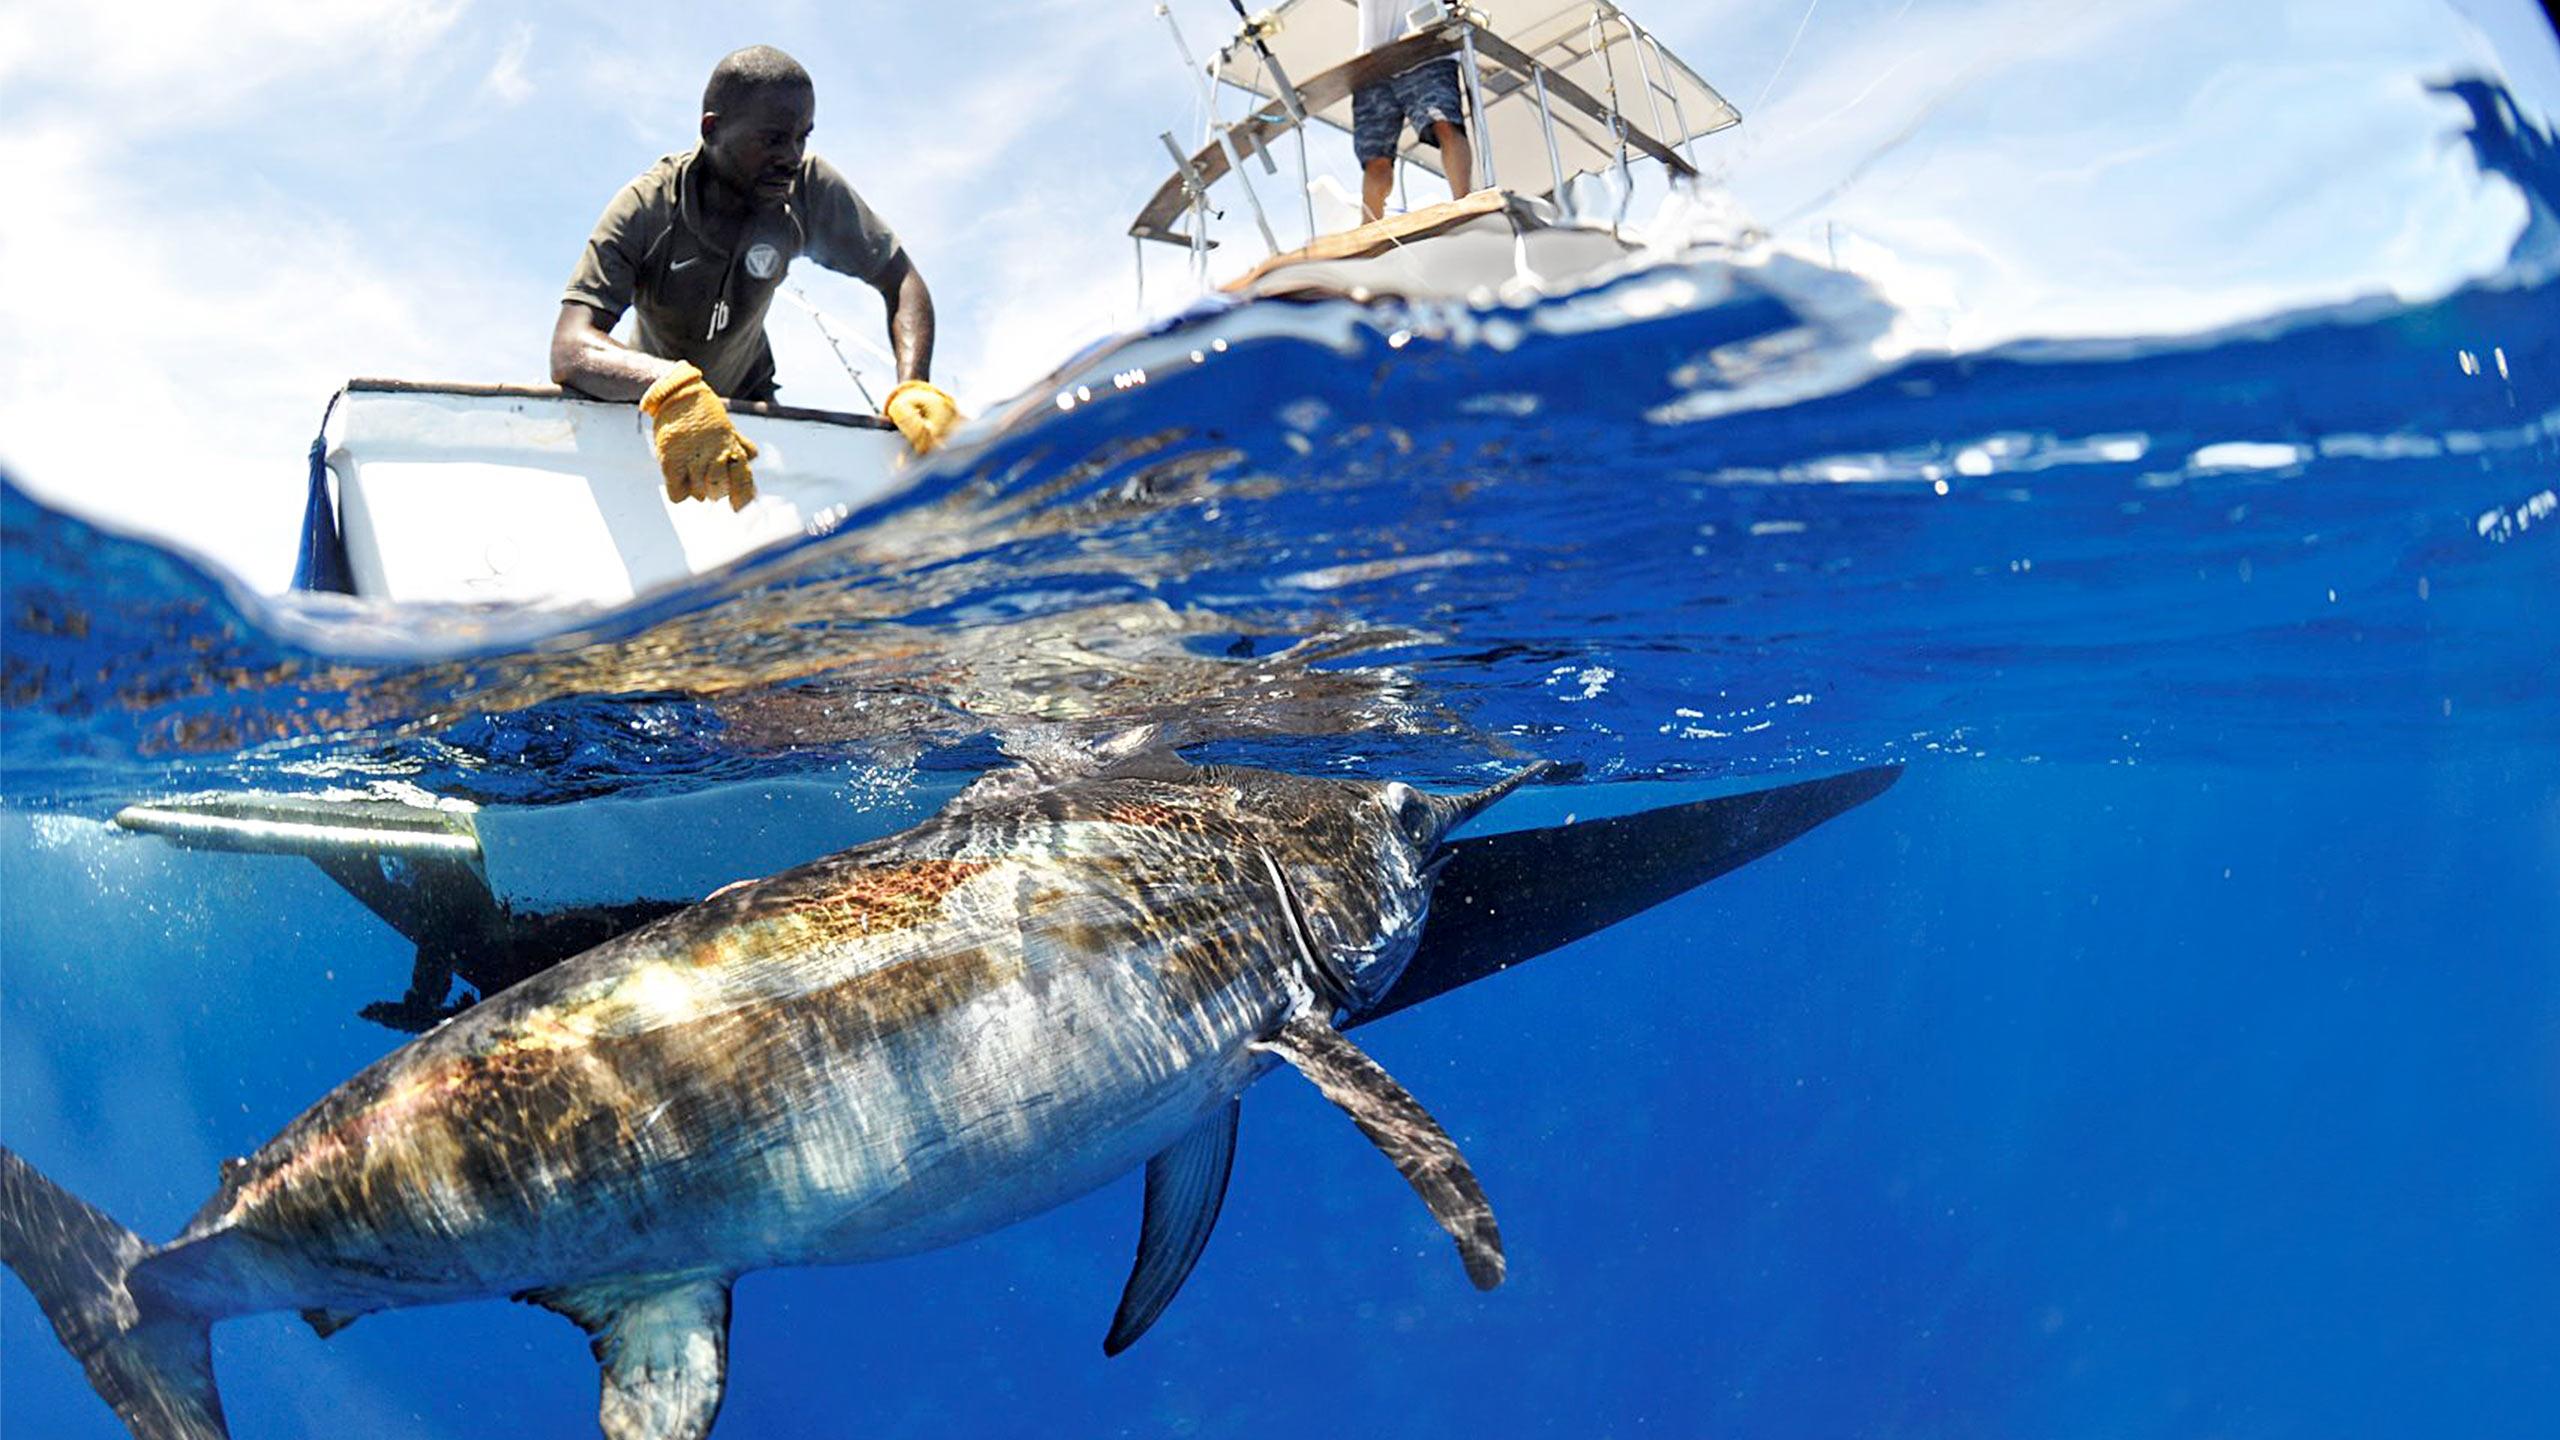 DORSAL EXCURSION BACKPACK FISHING MARLIN